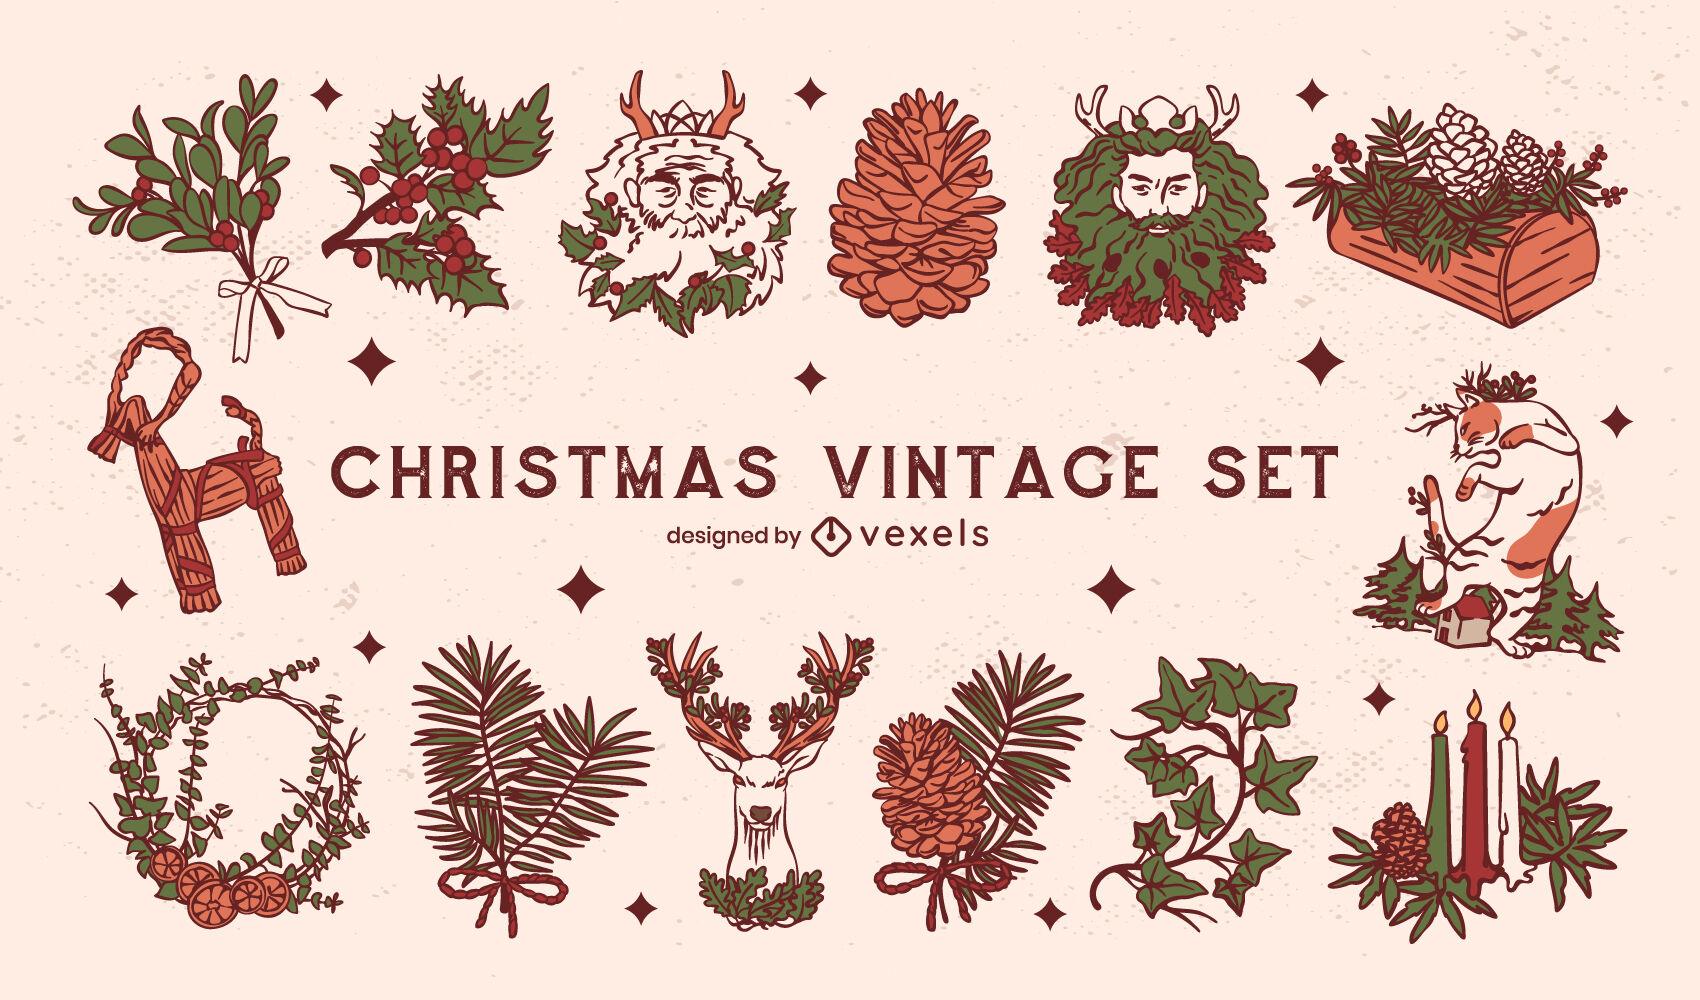 Christmas holiday nature vintage set